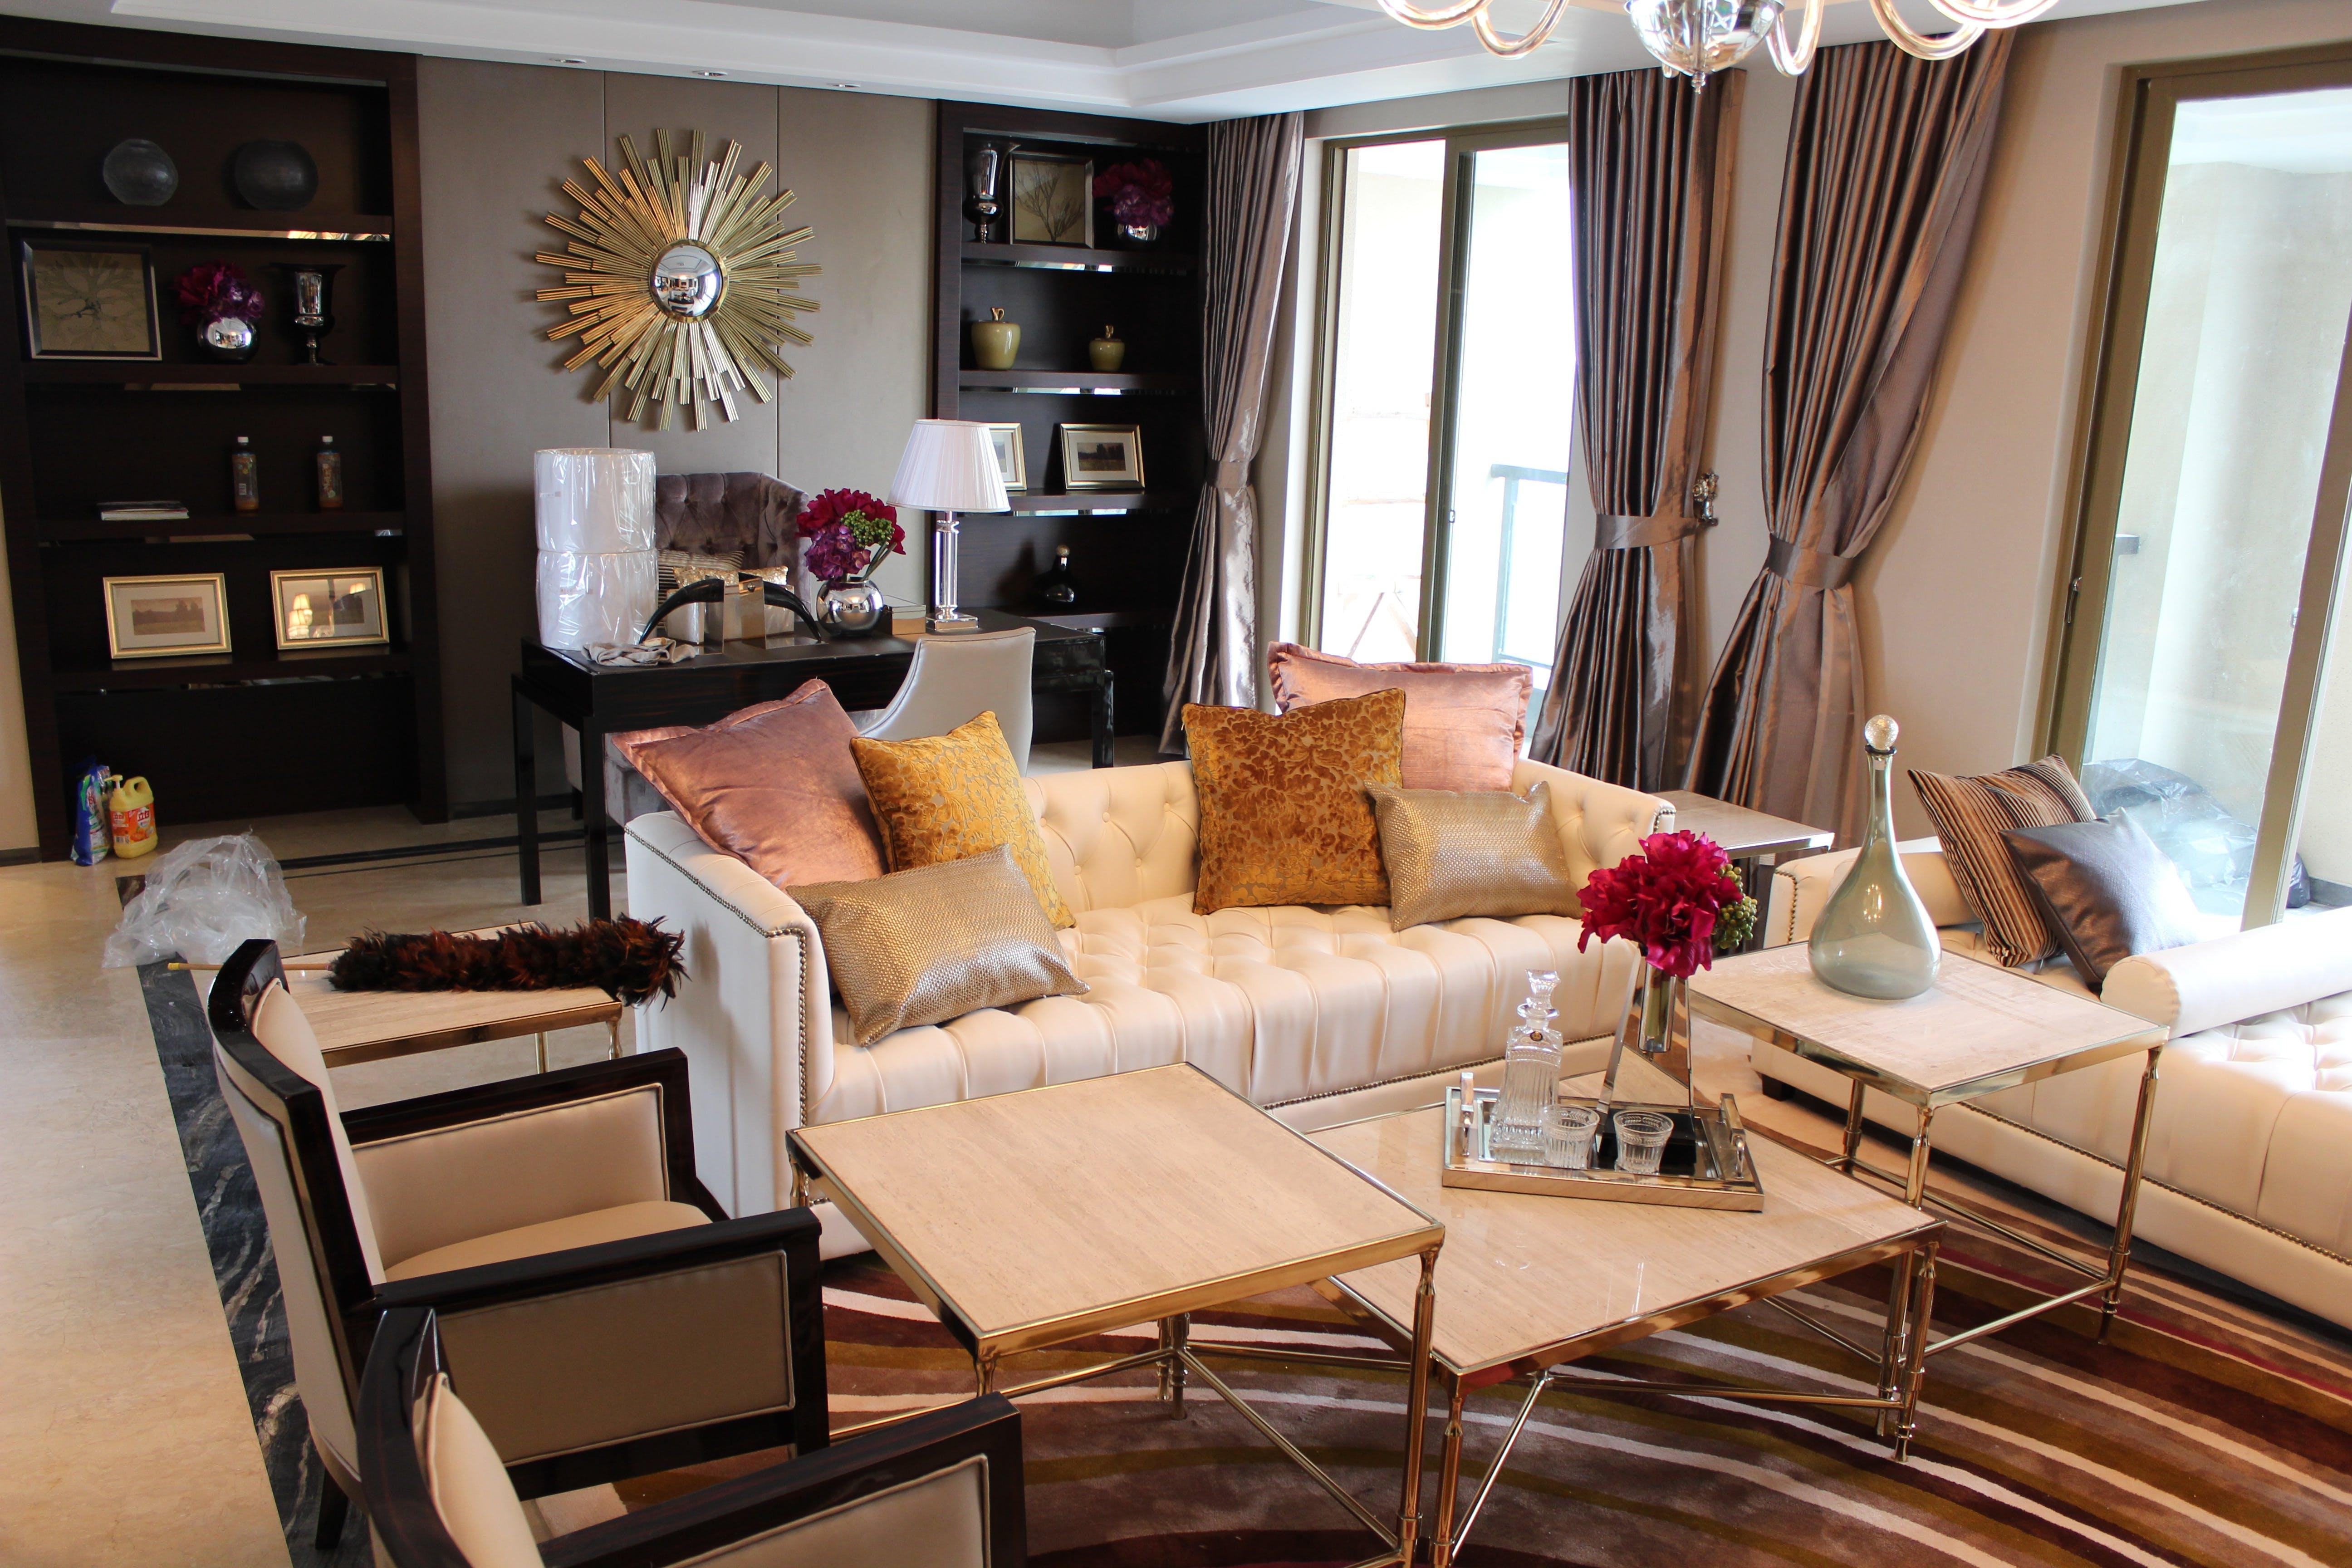 decoration, interior design, living room